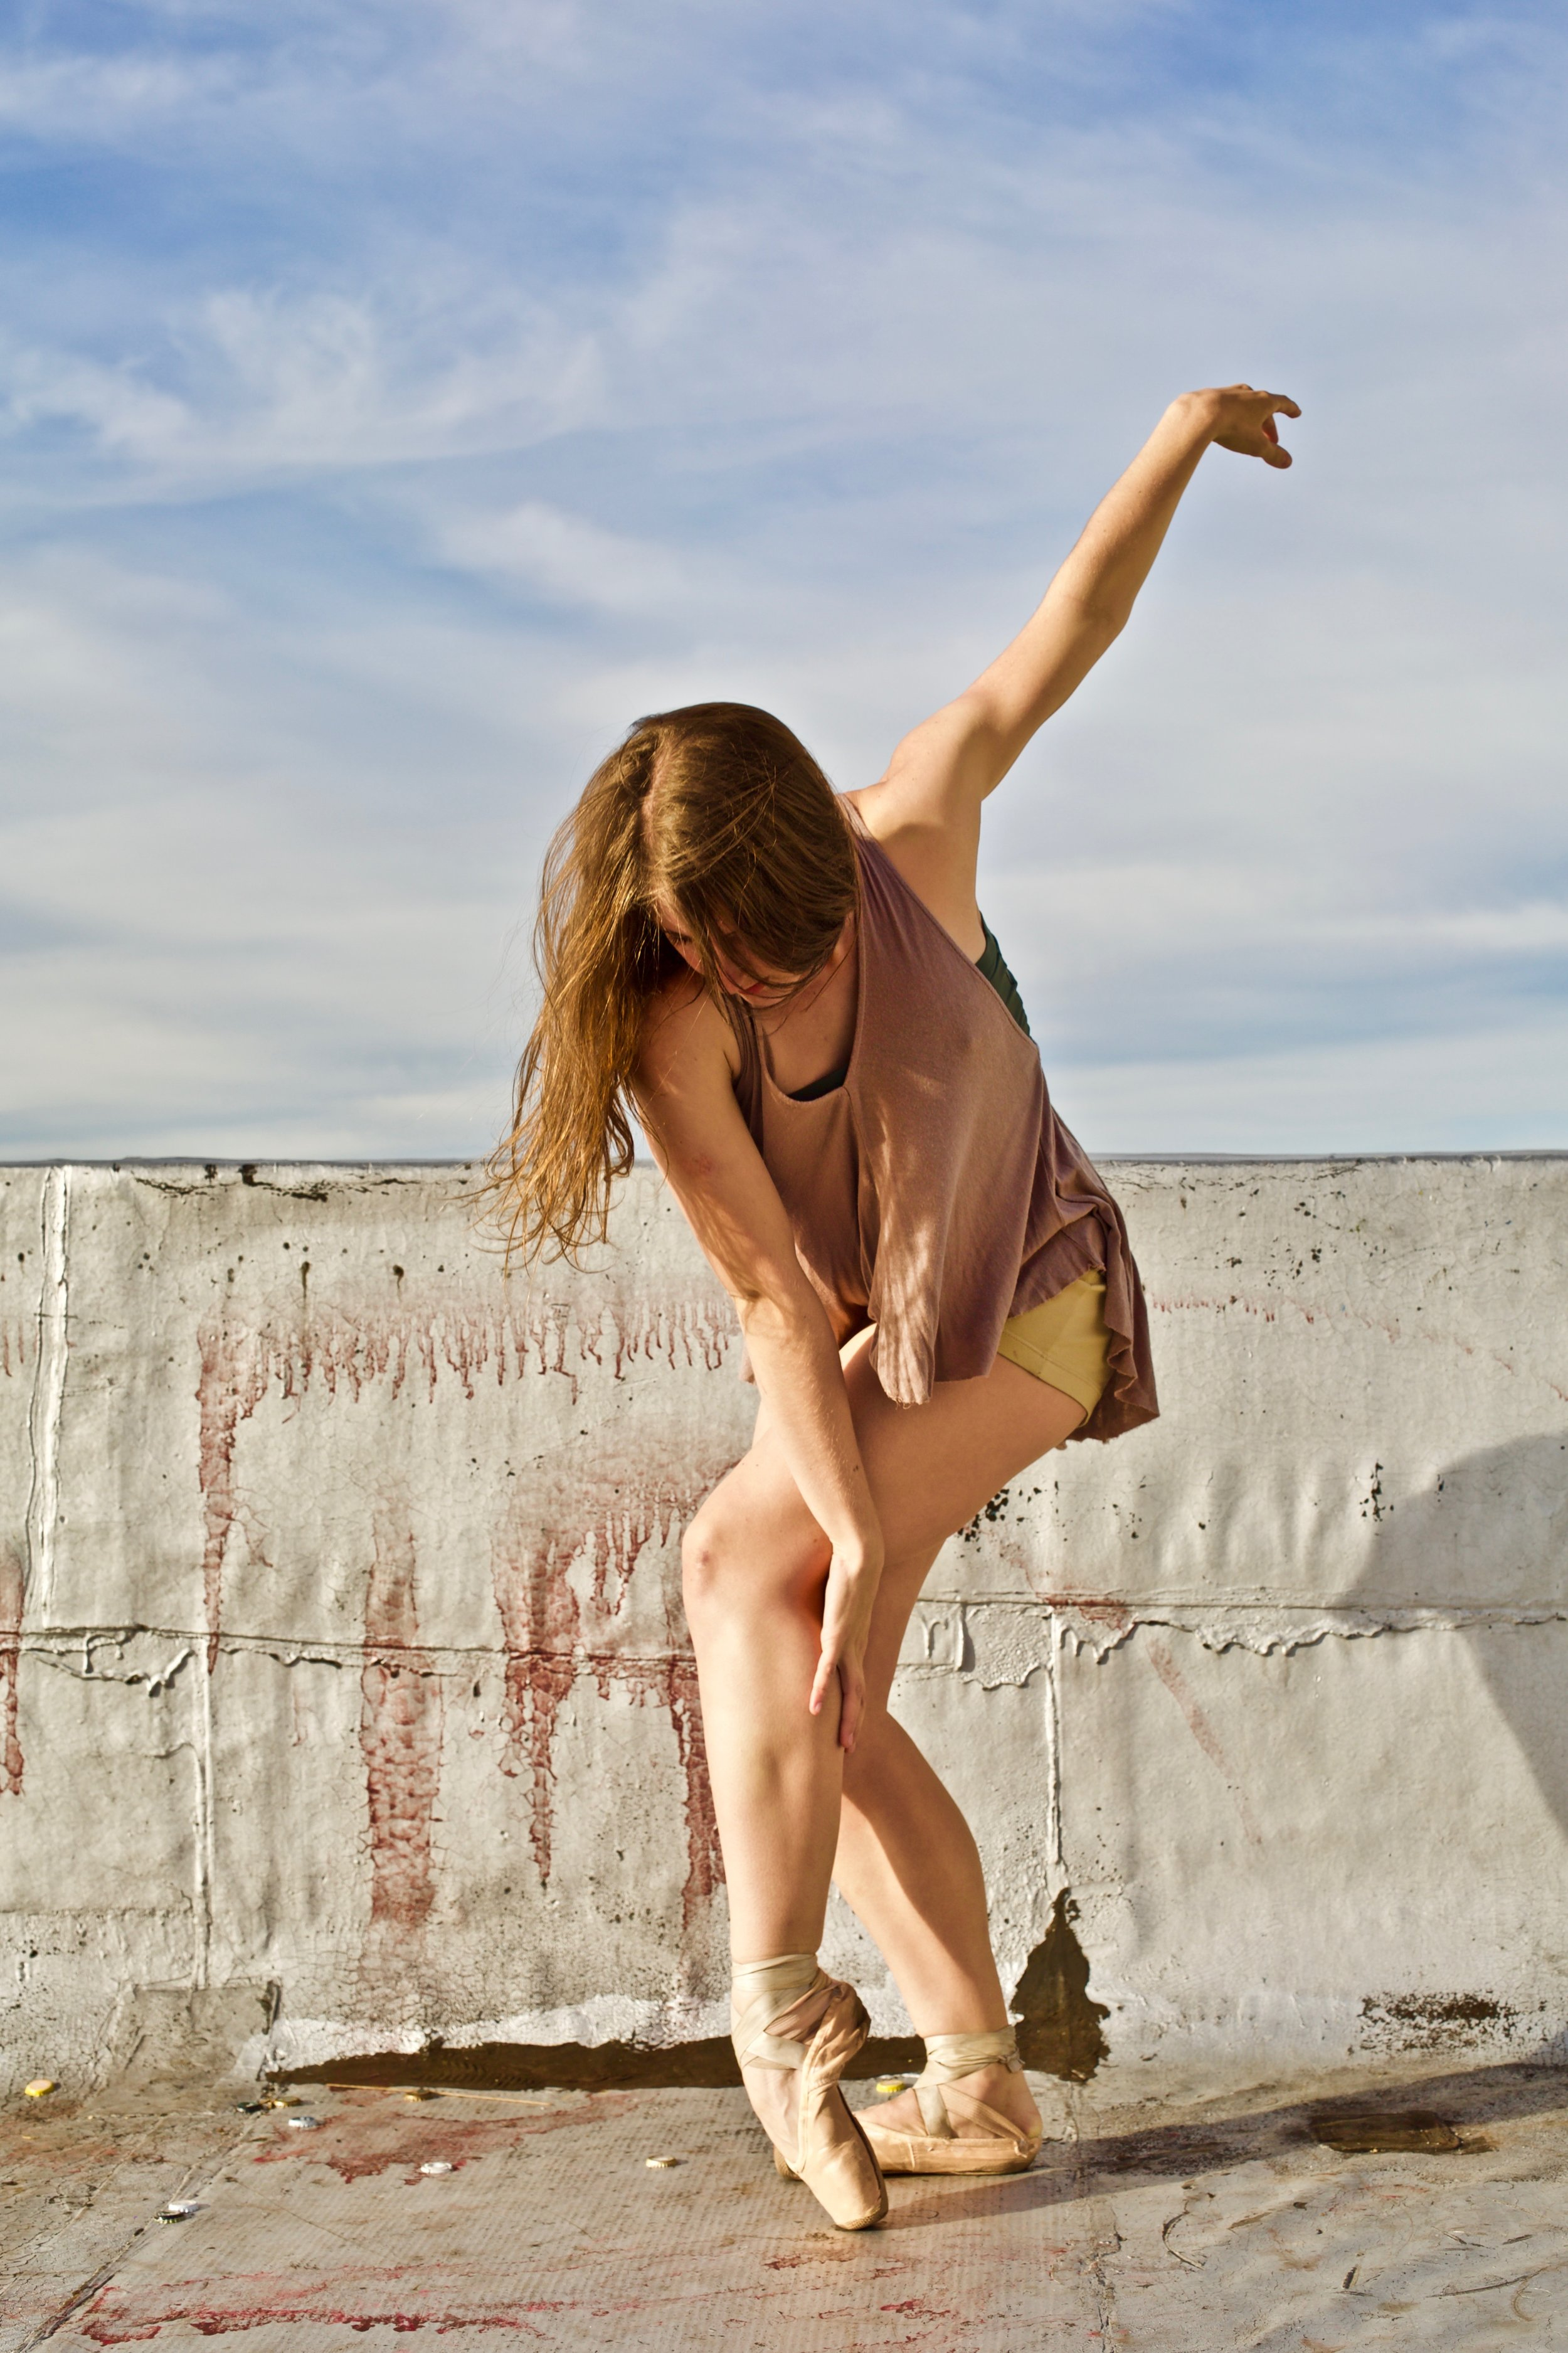 Amy Saunder of konverjdans